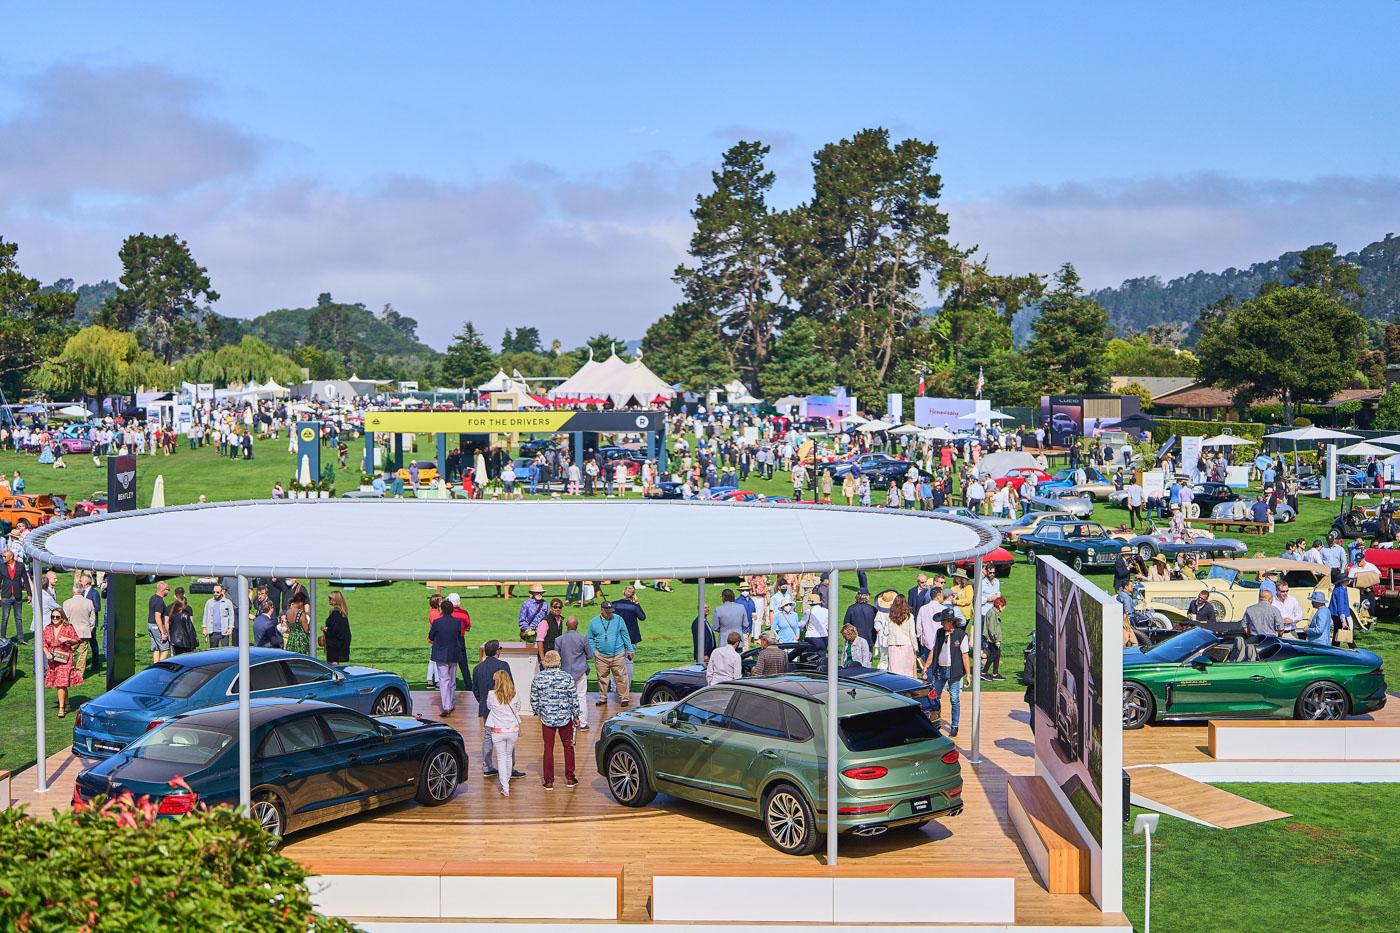 Nhin-lai-6-mau-bentley-an-tuong-nhat-tai-tuan-le-xe-hoi-Monterey-2021 (8).JPG